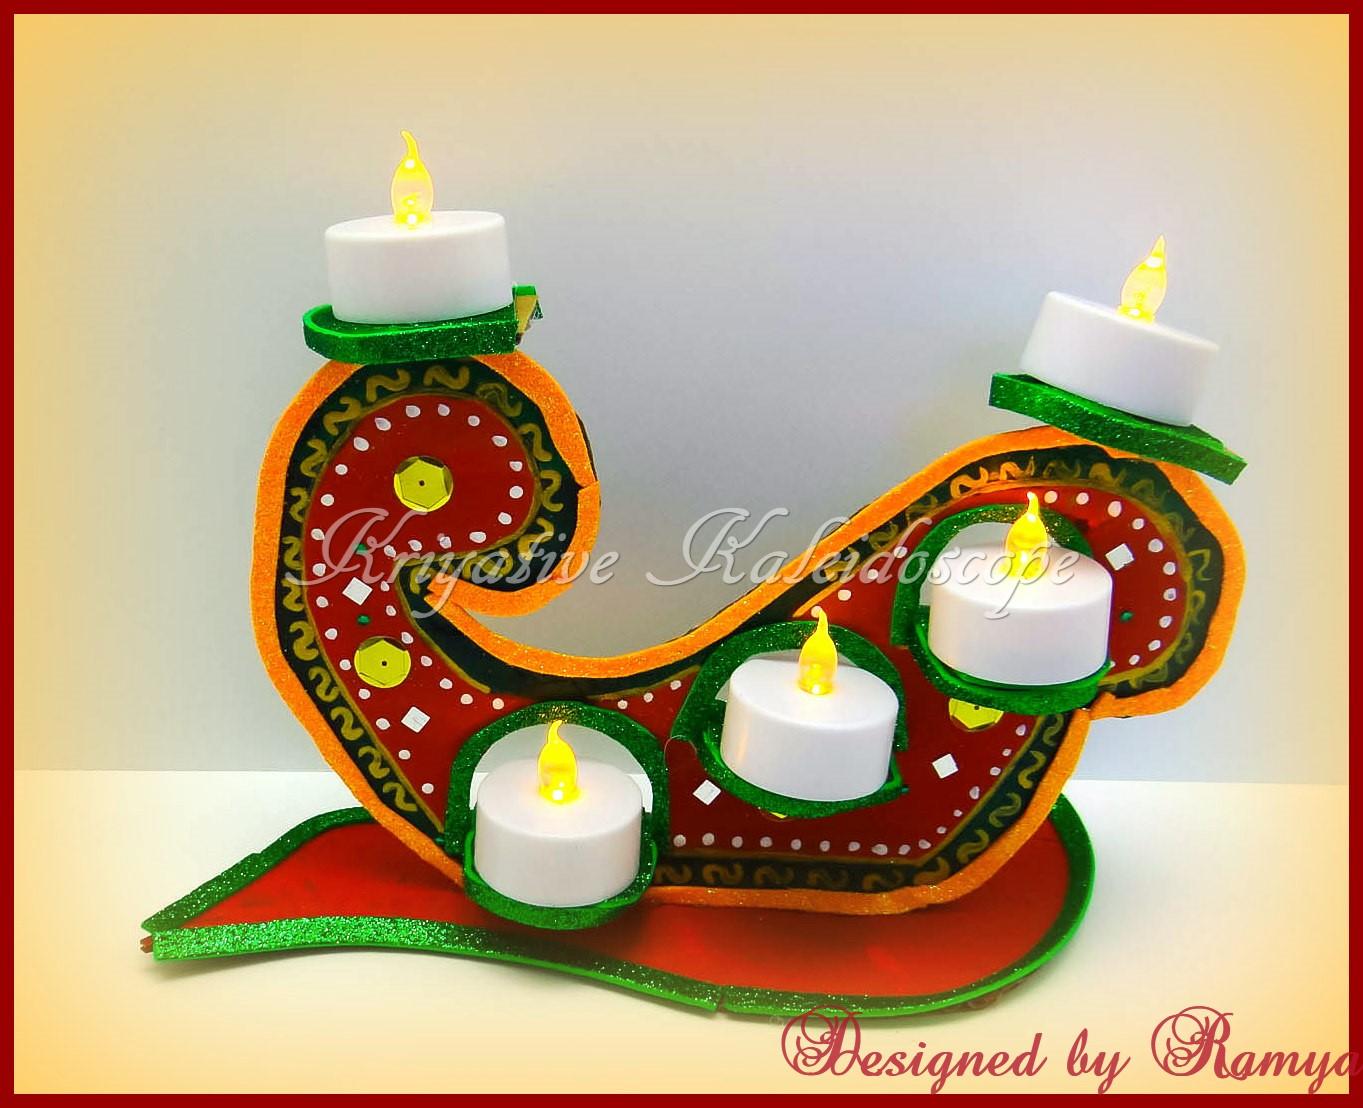 home decoration for diwali diya diy diwali diya gilliter home diwali decorations kriya tive kaleidoscope 10 unique diwali crafts and decor ideas